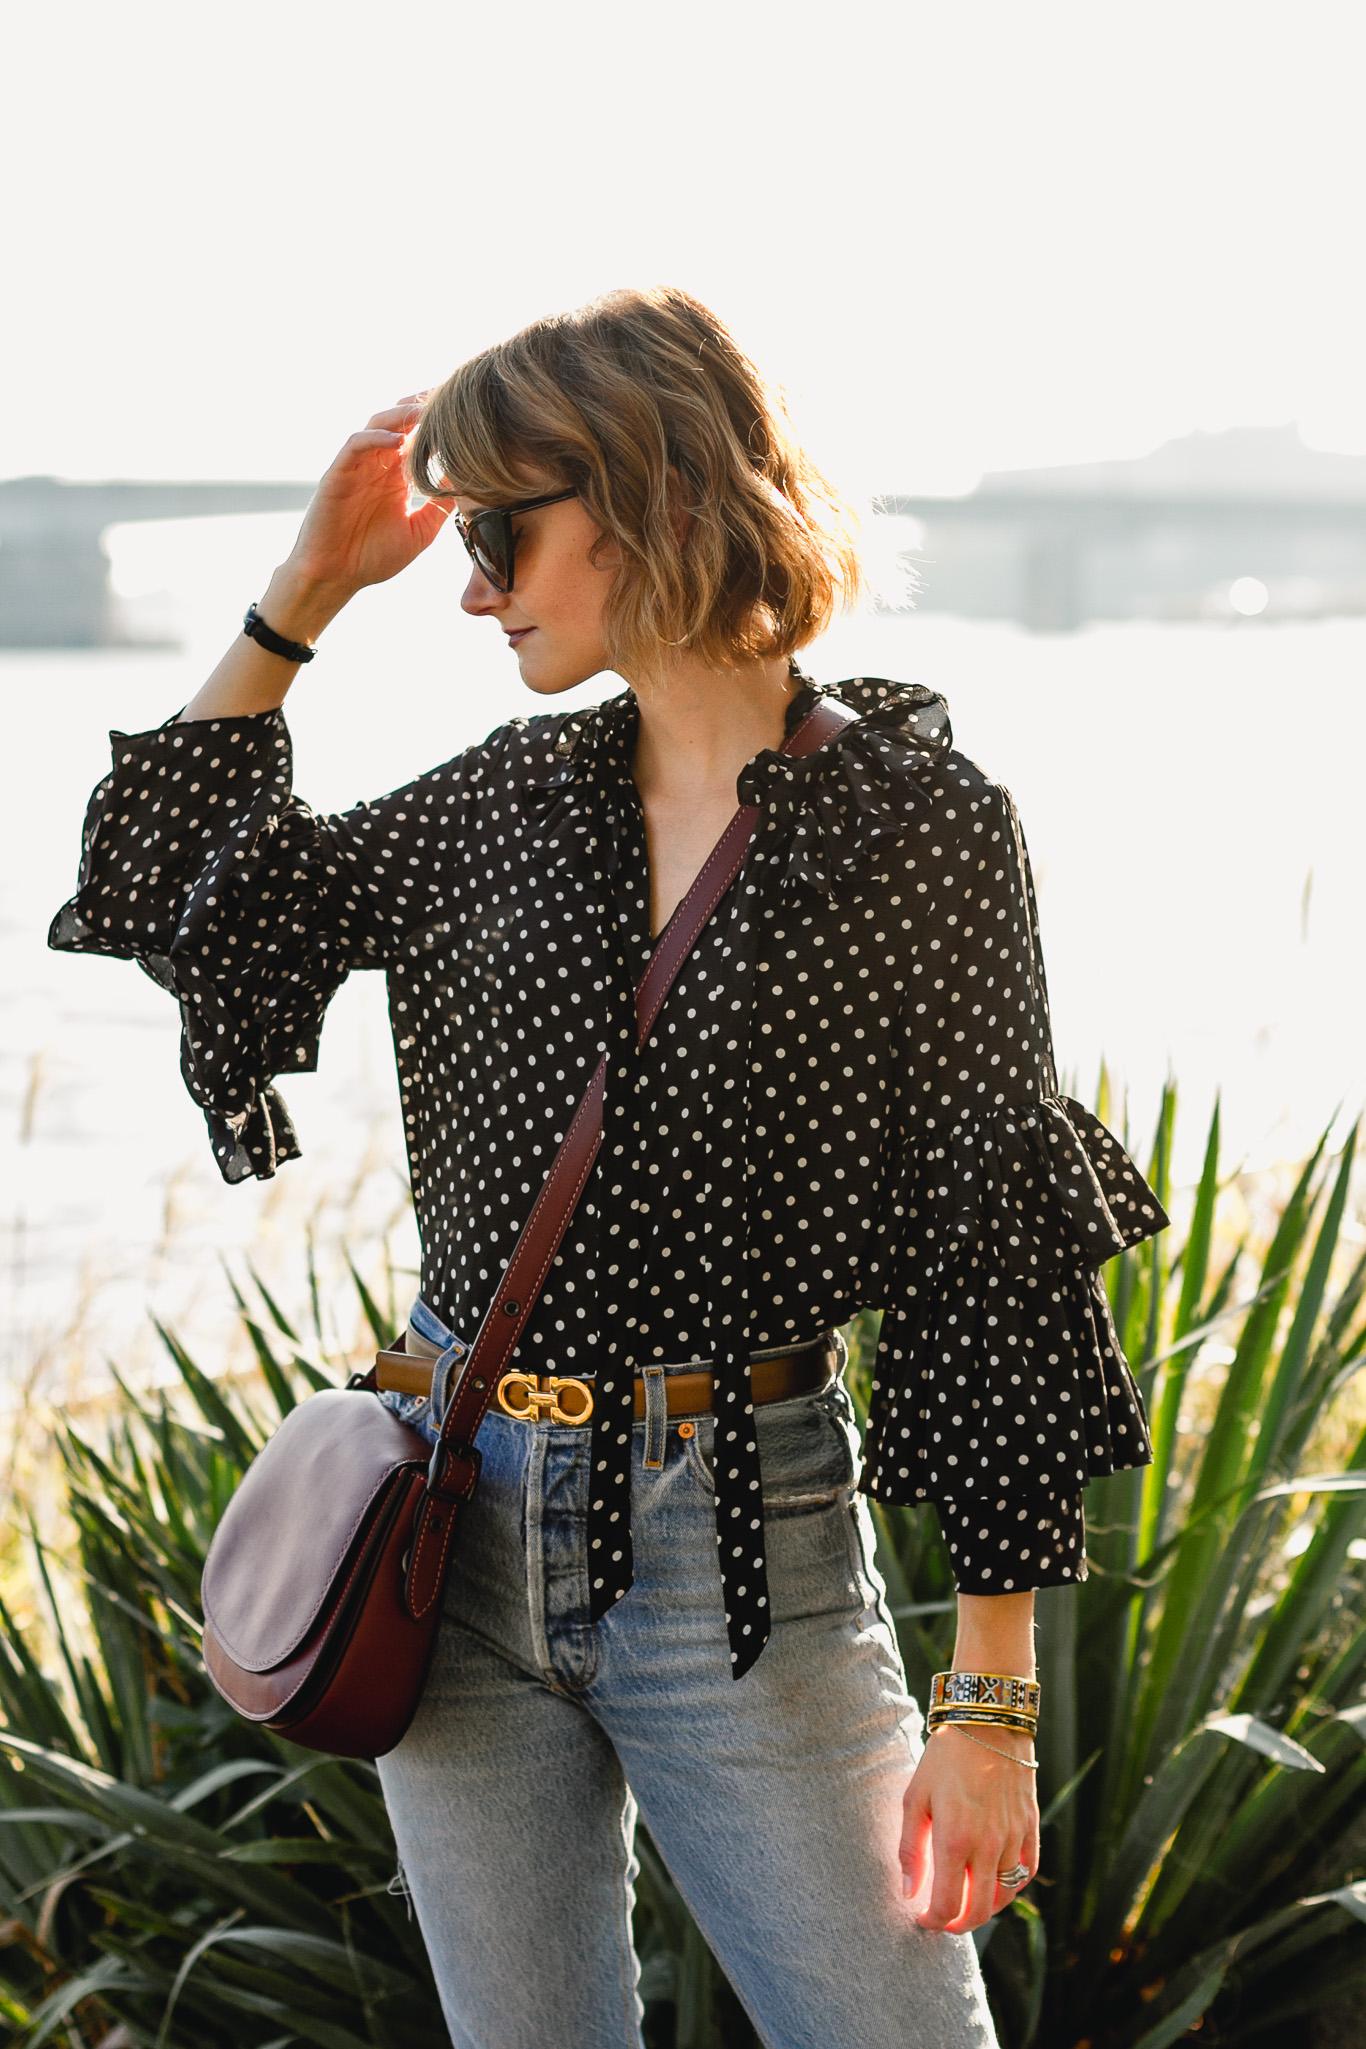 ruffled polka dot top, Ferragamo belt, and Coach bag